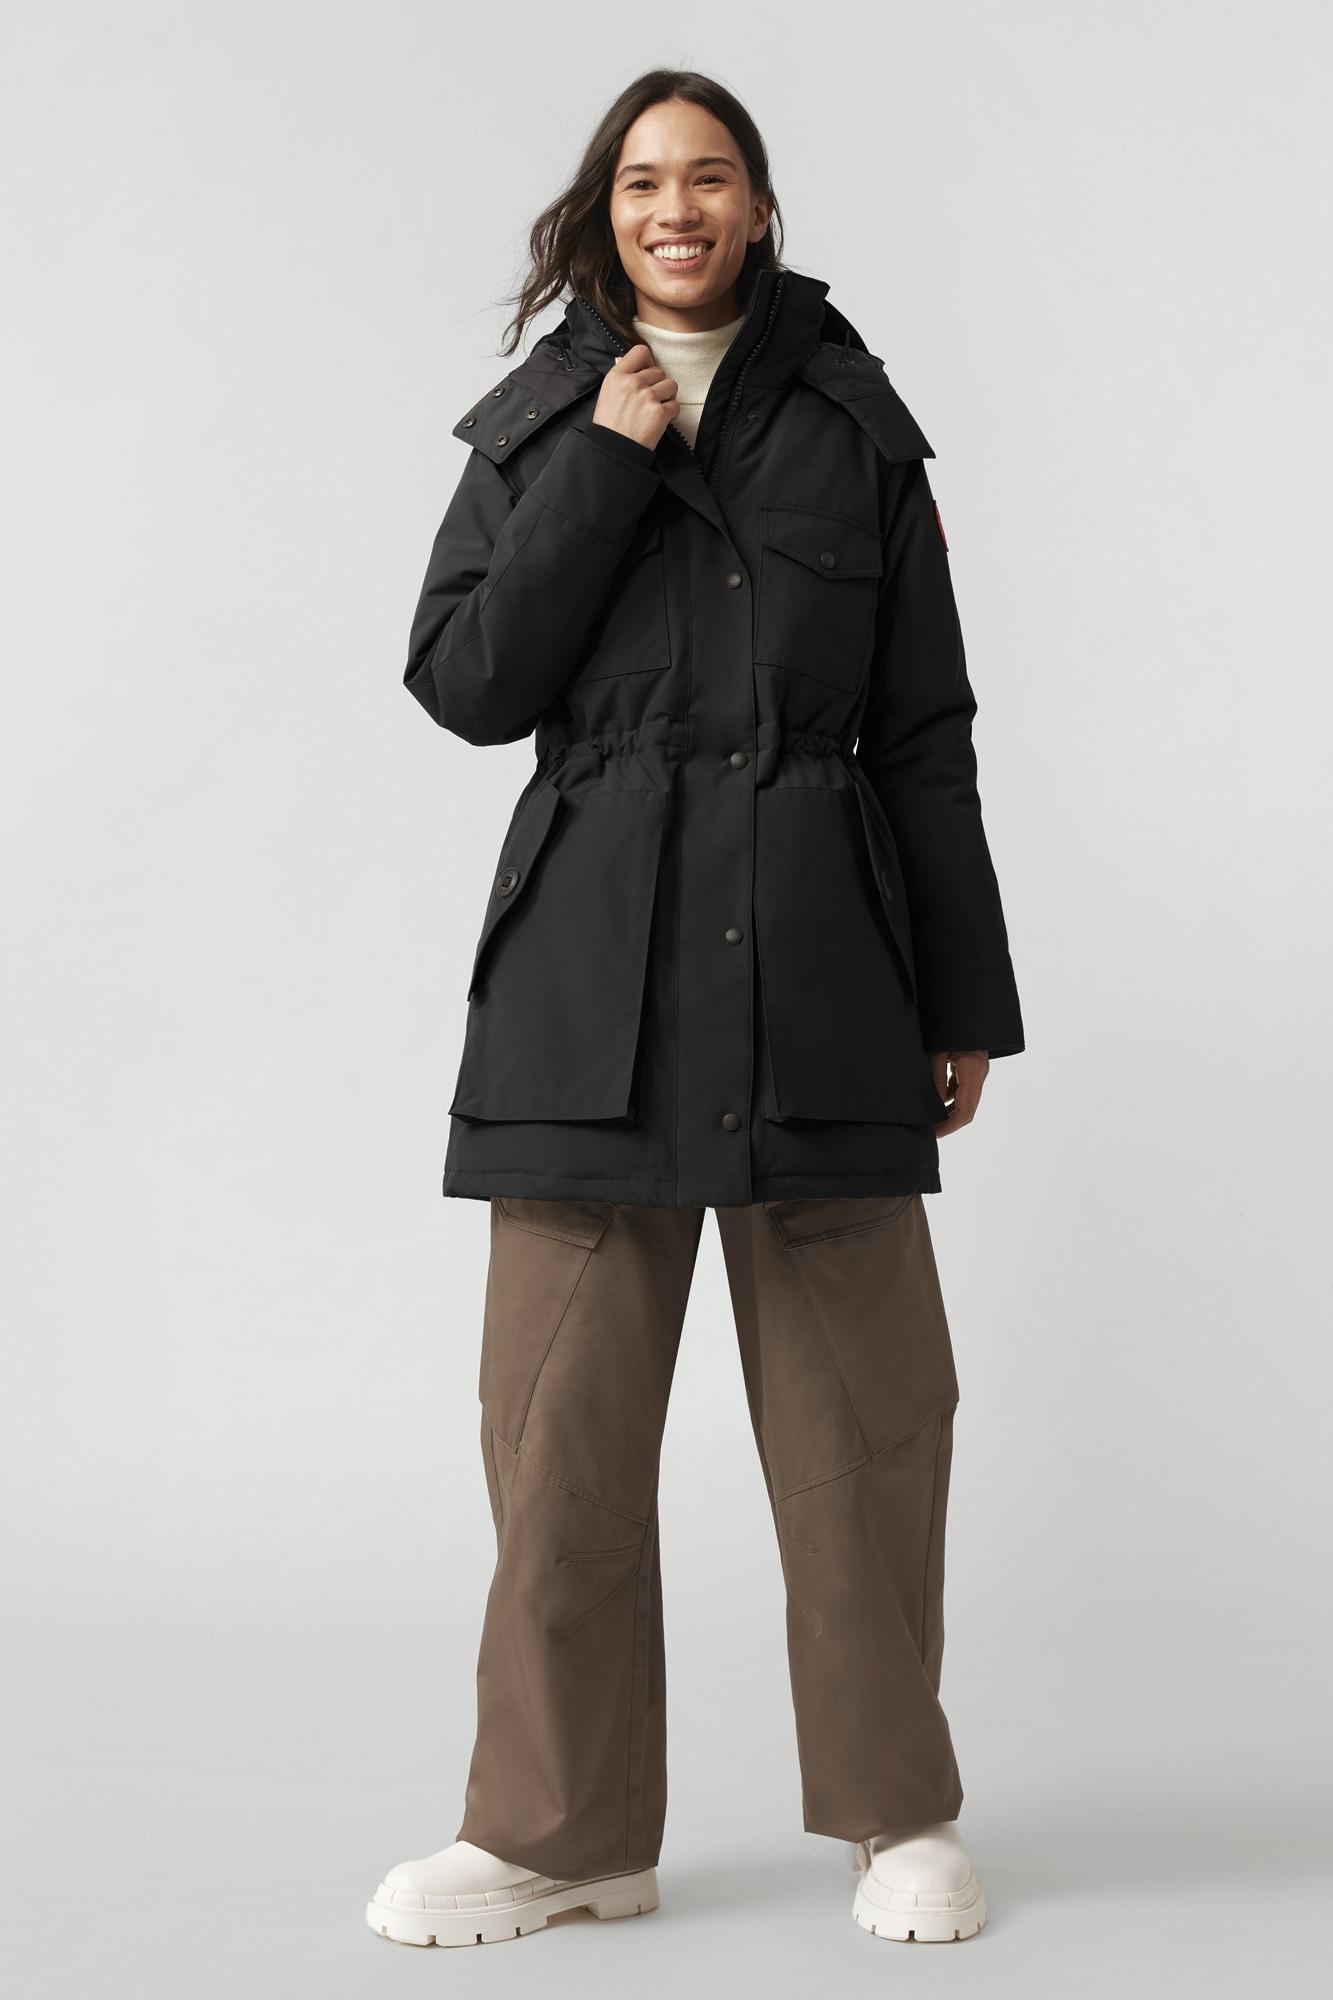 Canada Goose 加拿大鹅 Gabriola 女式派克大衣羽绒服 9折$742.5 海淘转运到手约¥5035